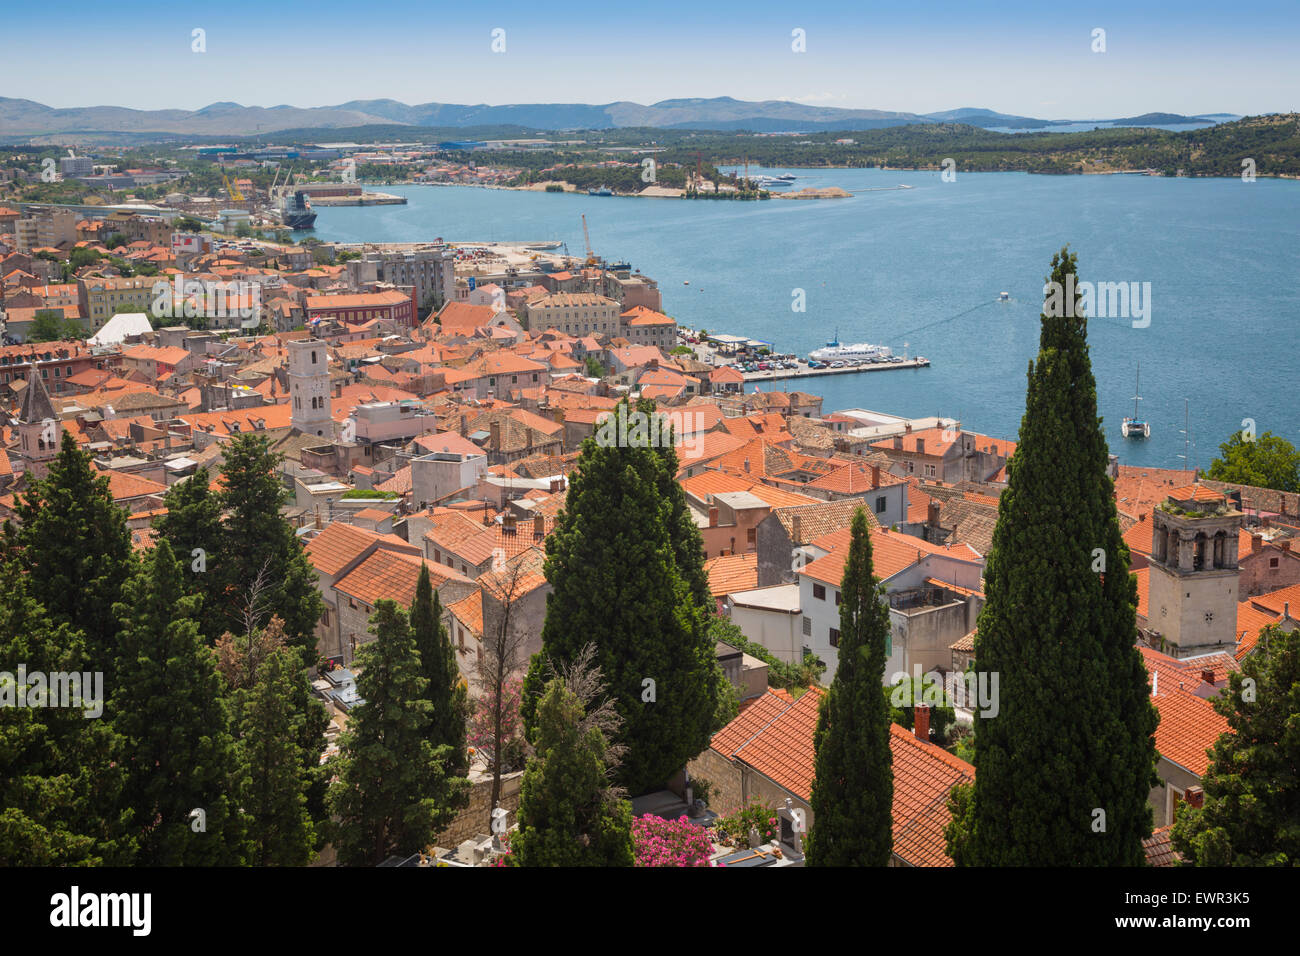 Sibenik, Sibenik-Knin County, Dalmatia, Croatia.  Overall views of the town. - Stock Image